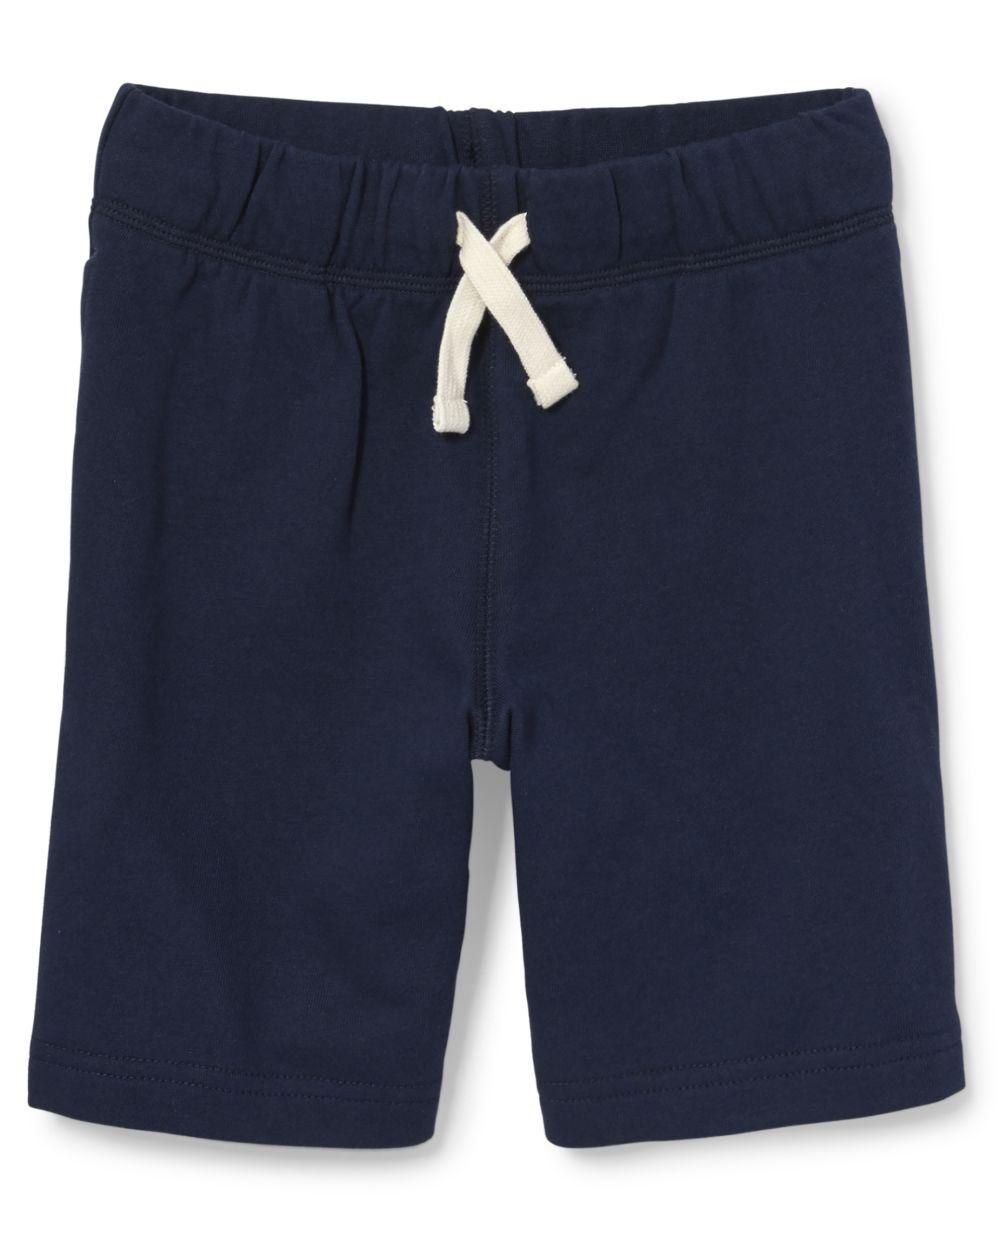 Boys Uniform French Terry Shorts